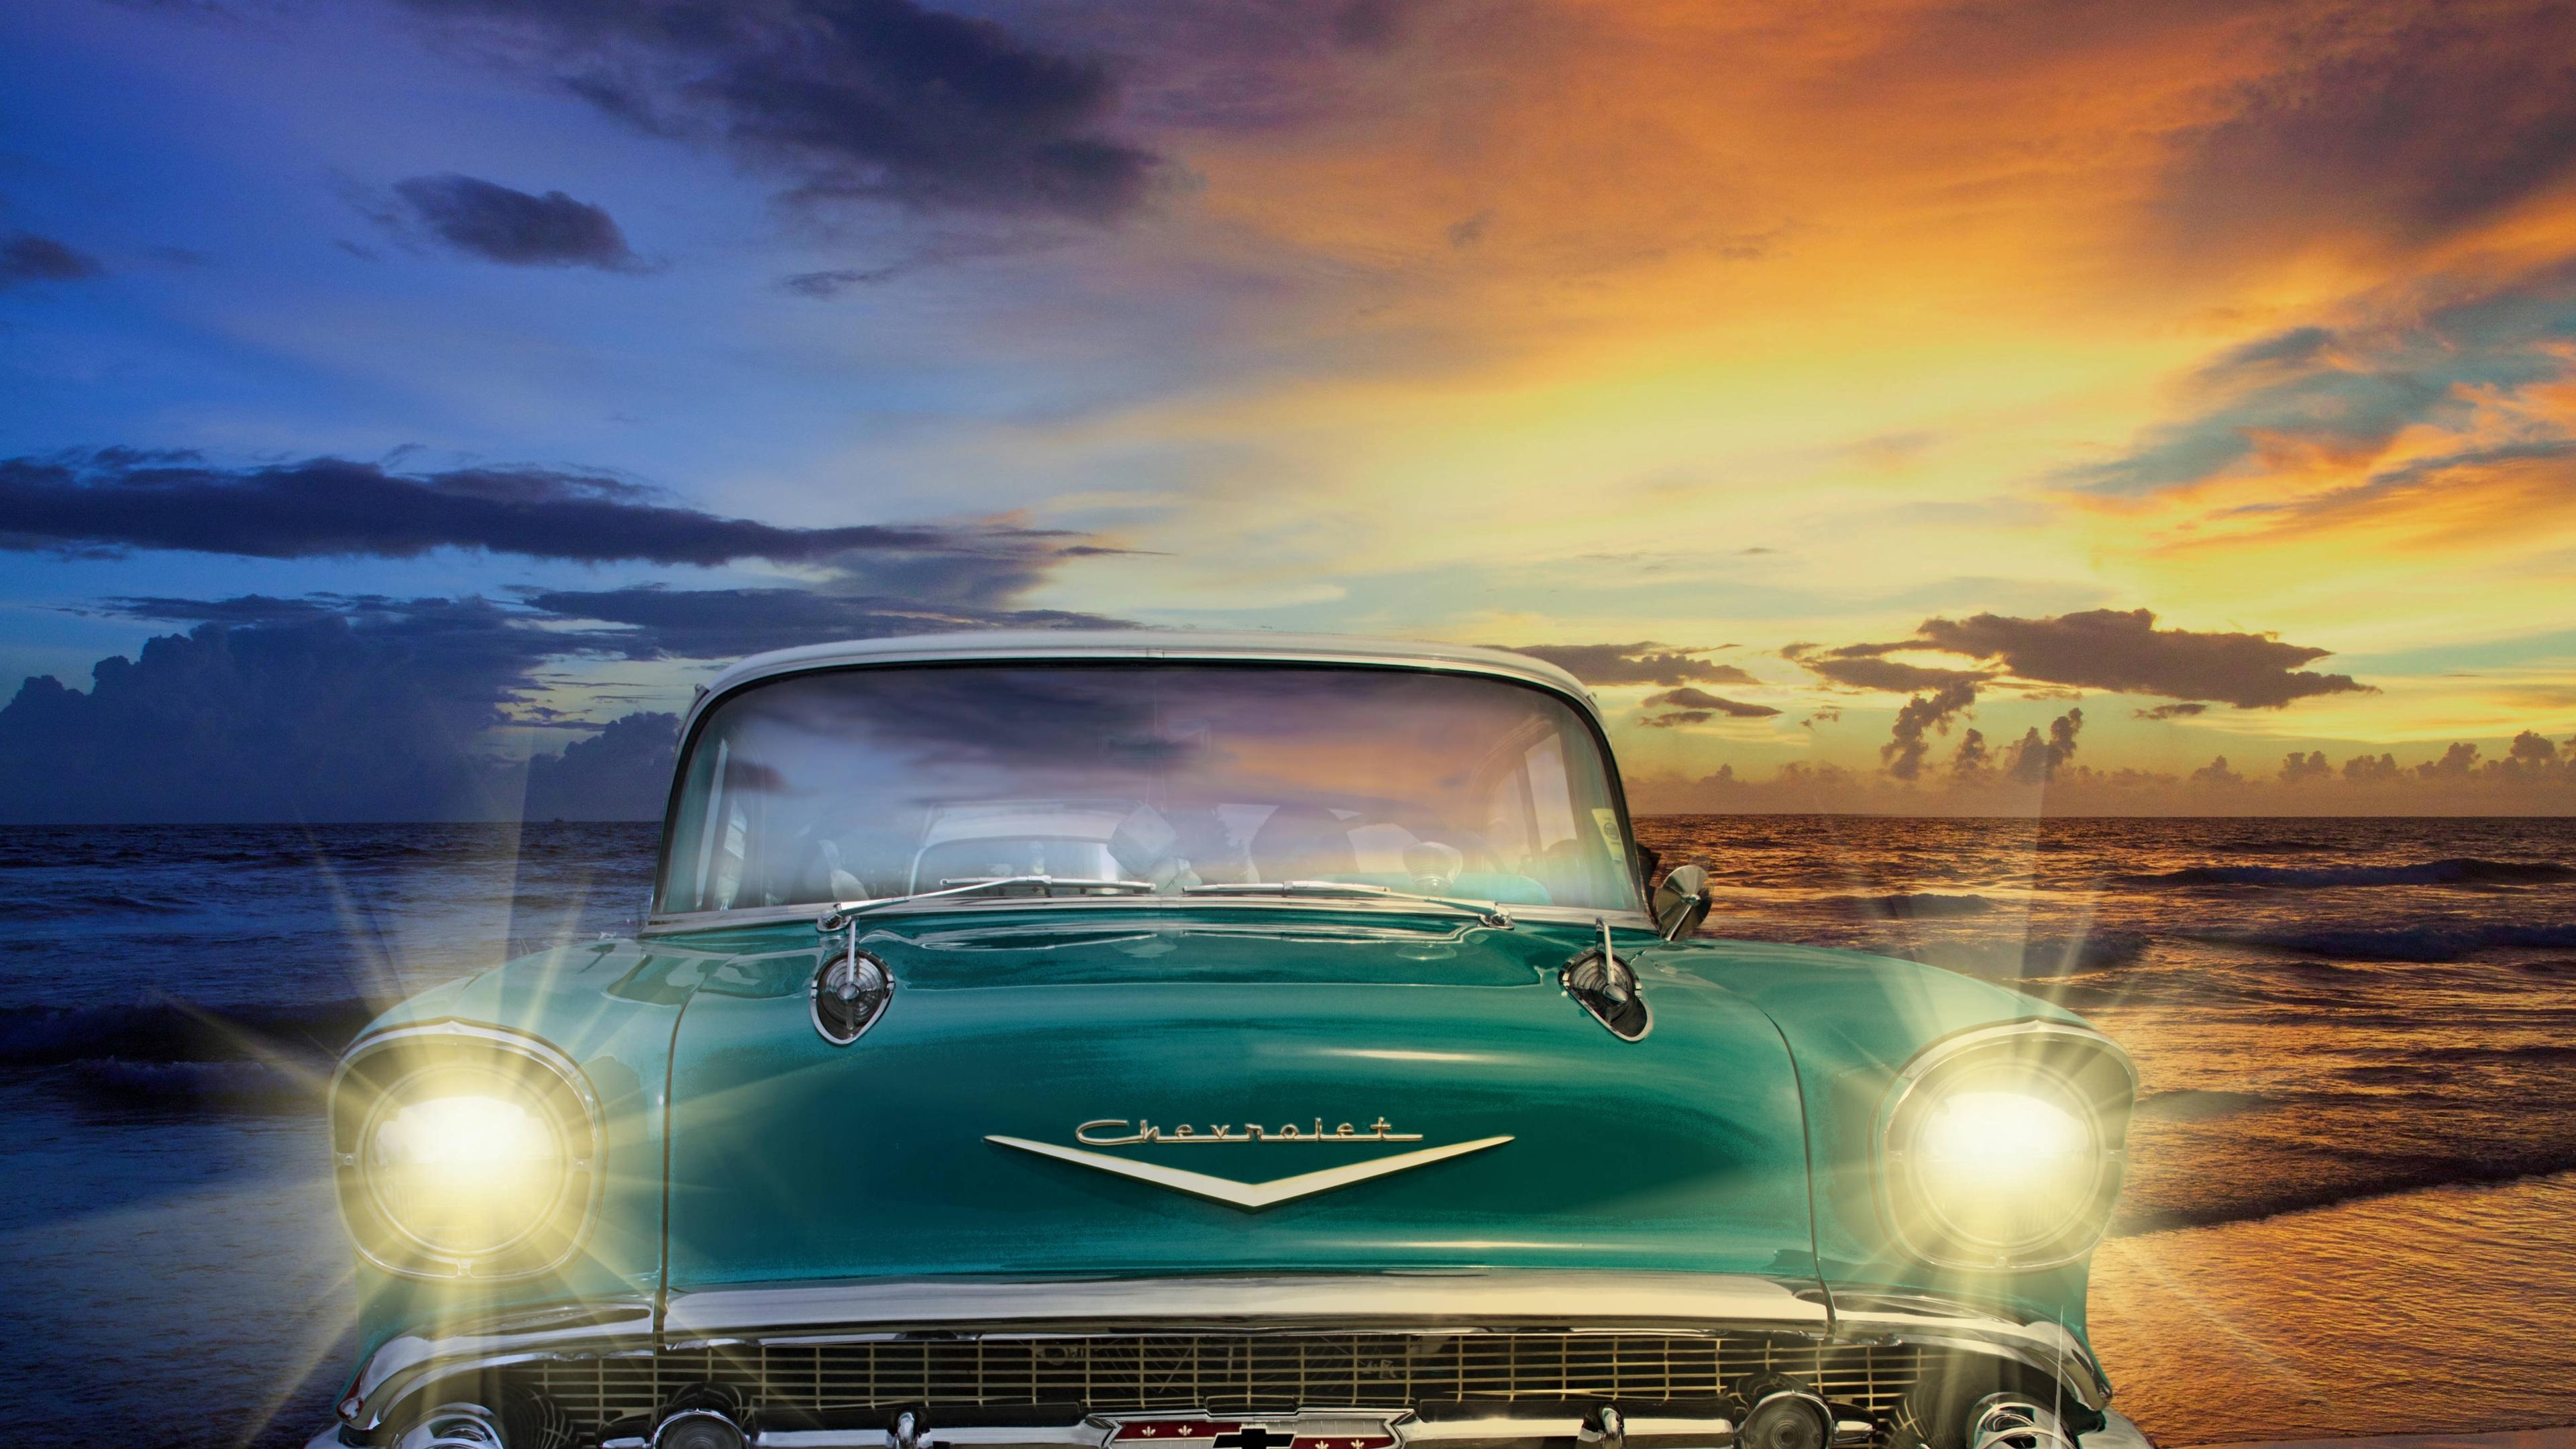 chevrolet old retro classic vintage car 1539107619 - Chevrolet Old Retro Classic Vintage Car - vintage wallpapers, vintage cars wallpapers, old wallpapers, hd-wallpapers, chevrolet wallpapers, cars wallpapers, 5k wallpapers, 4k-wallpapers